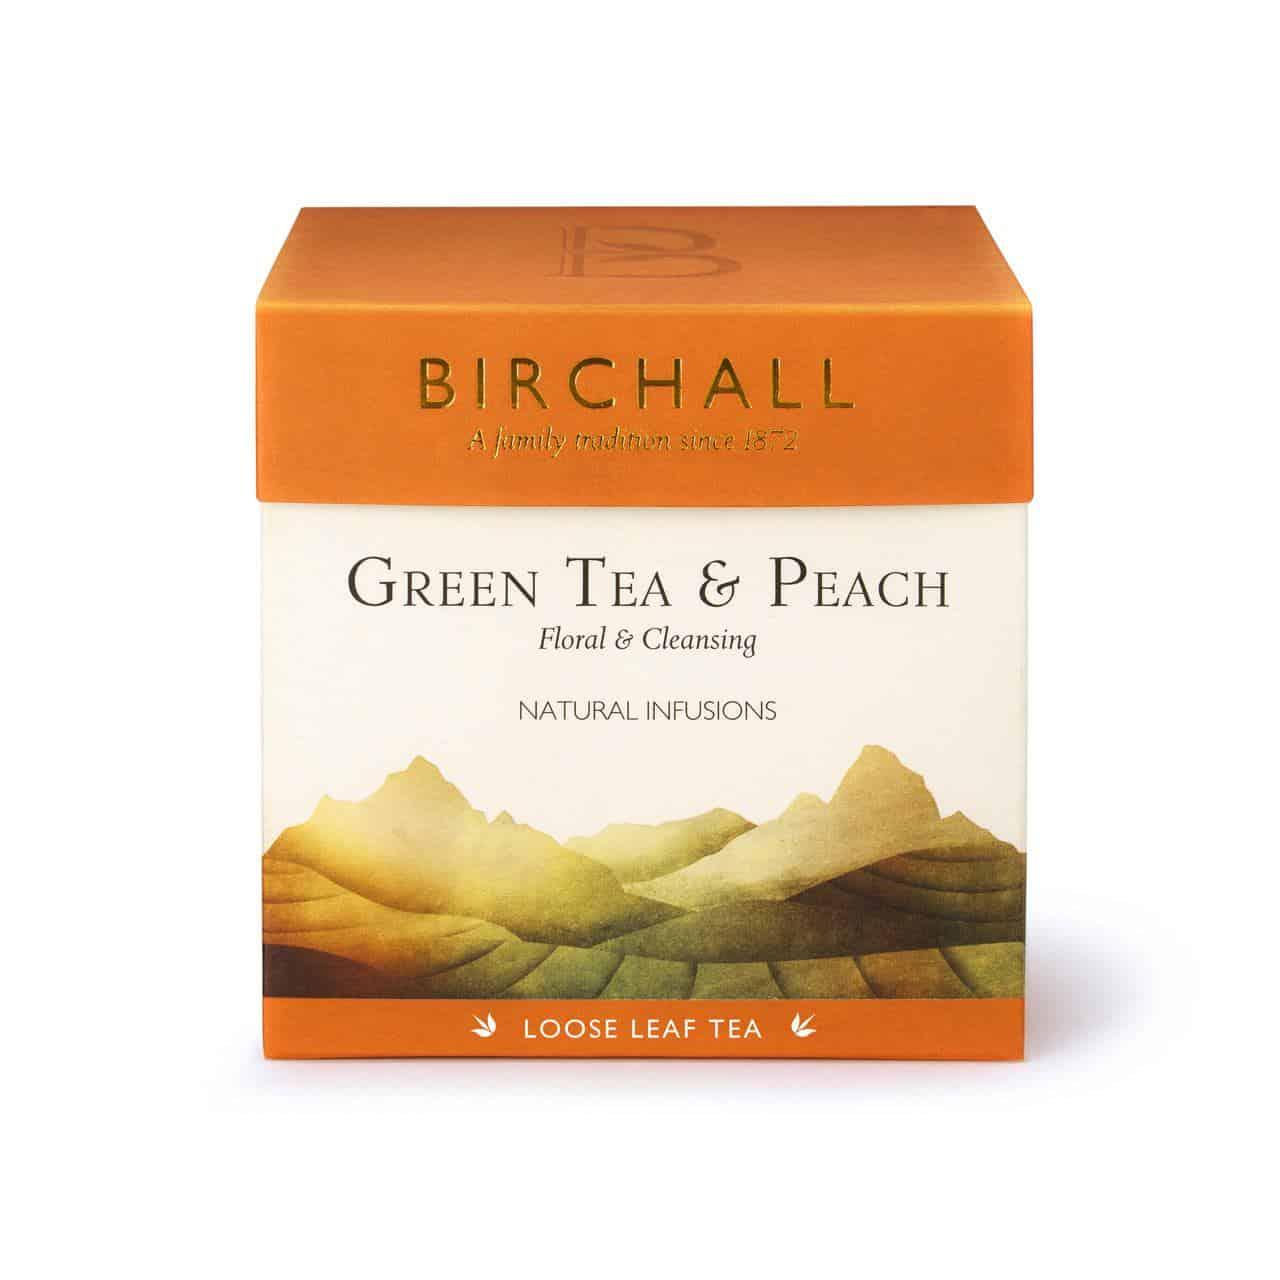 Birchall Green Tea & Peach - Loose Leaf Tea